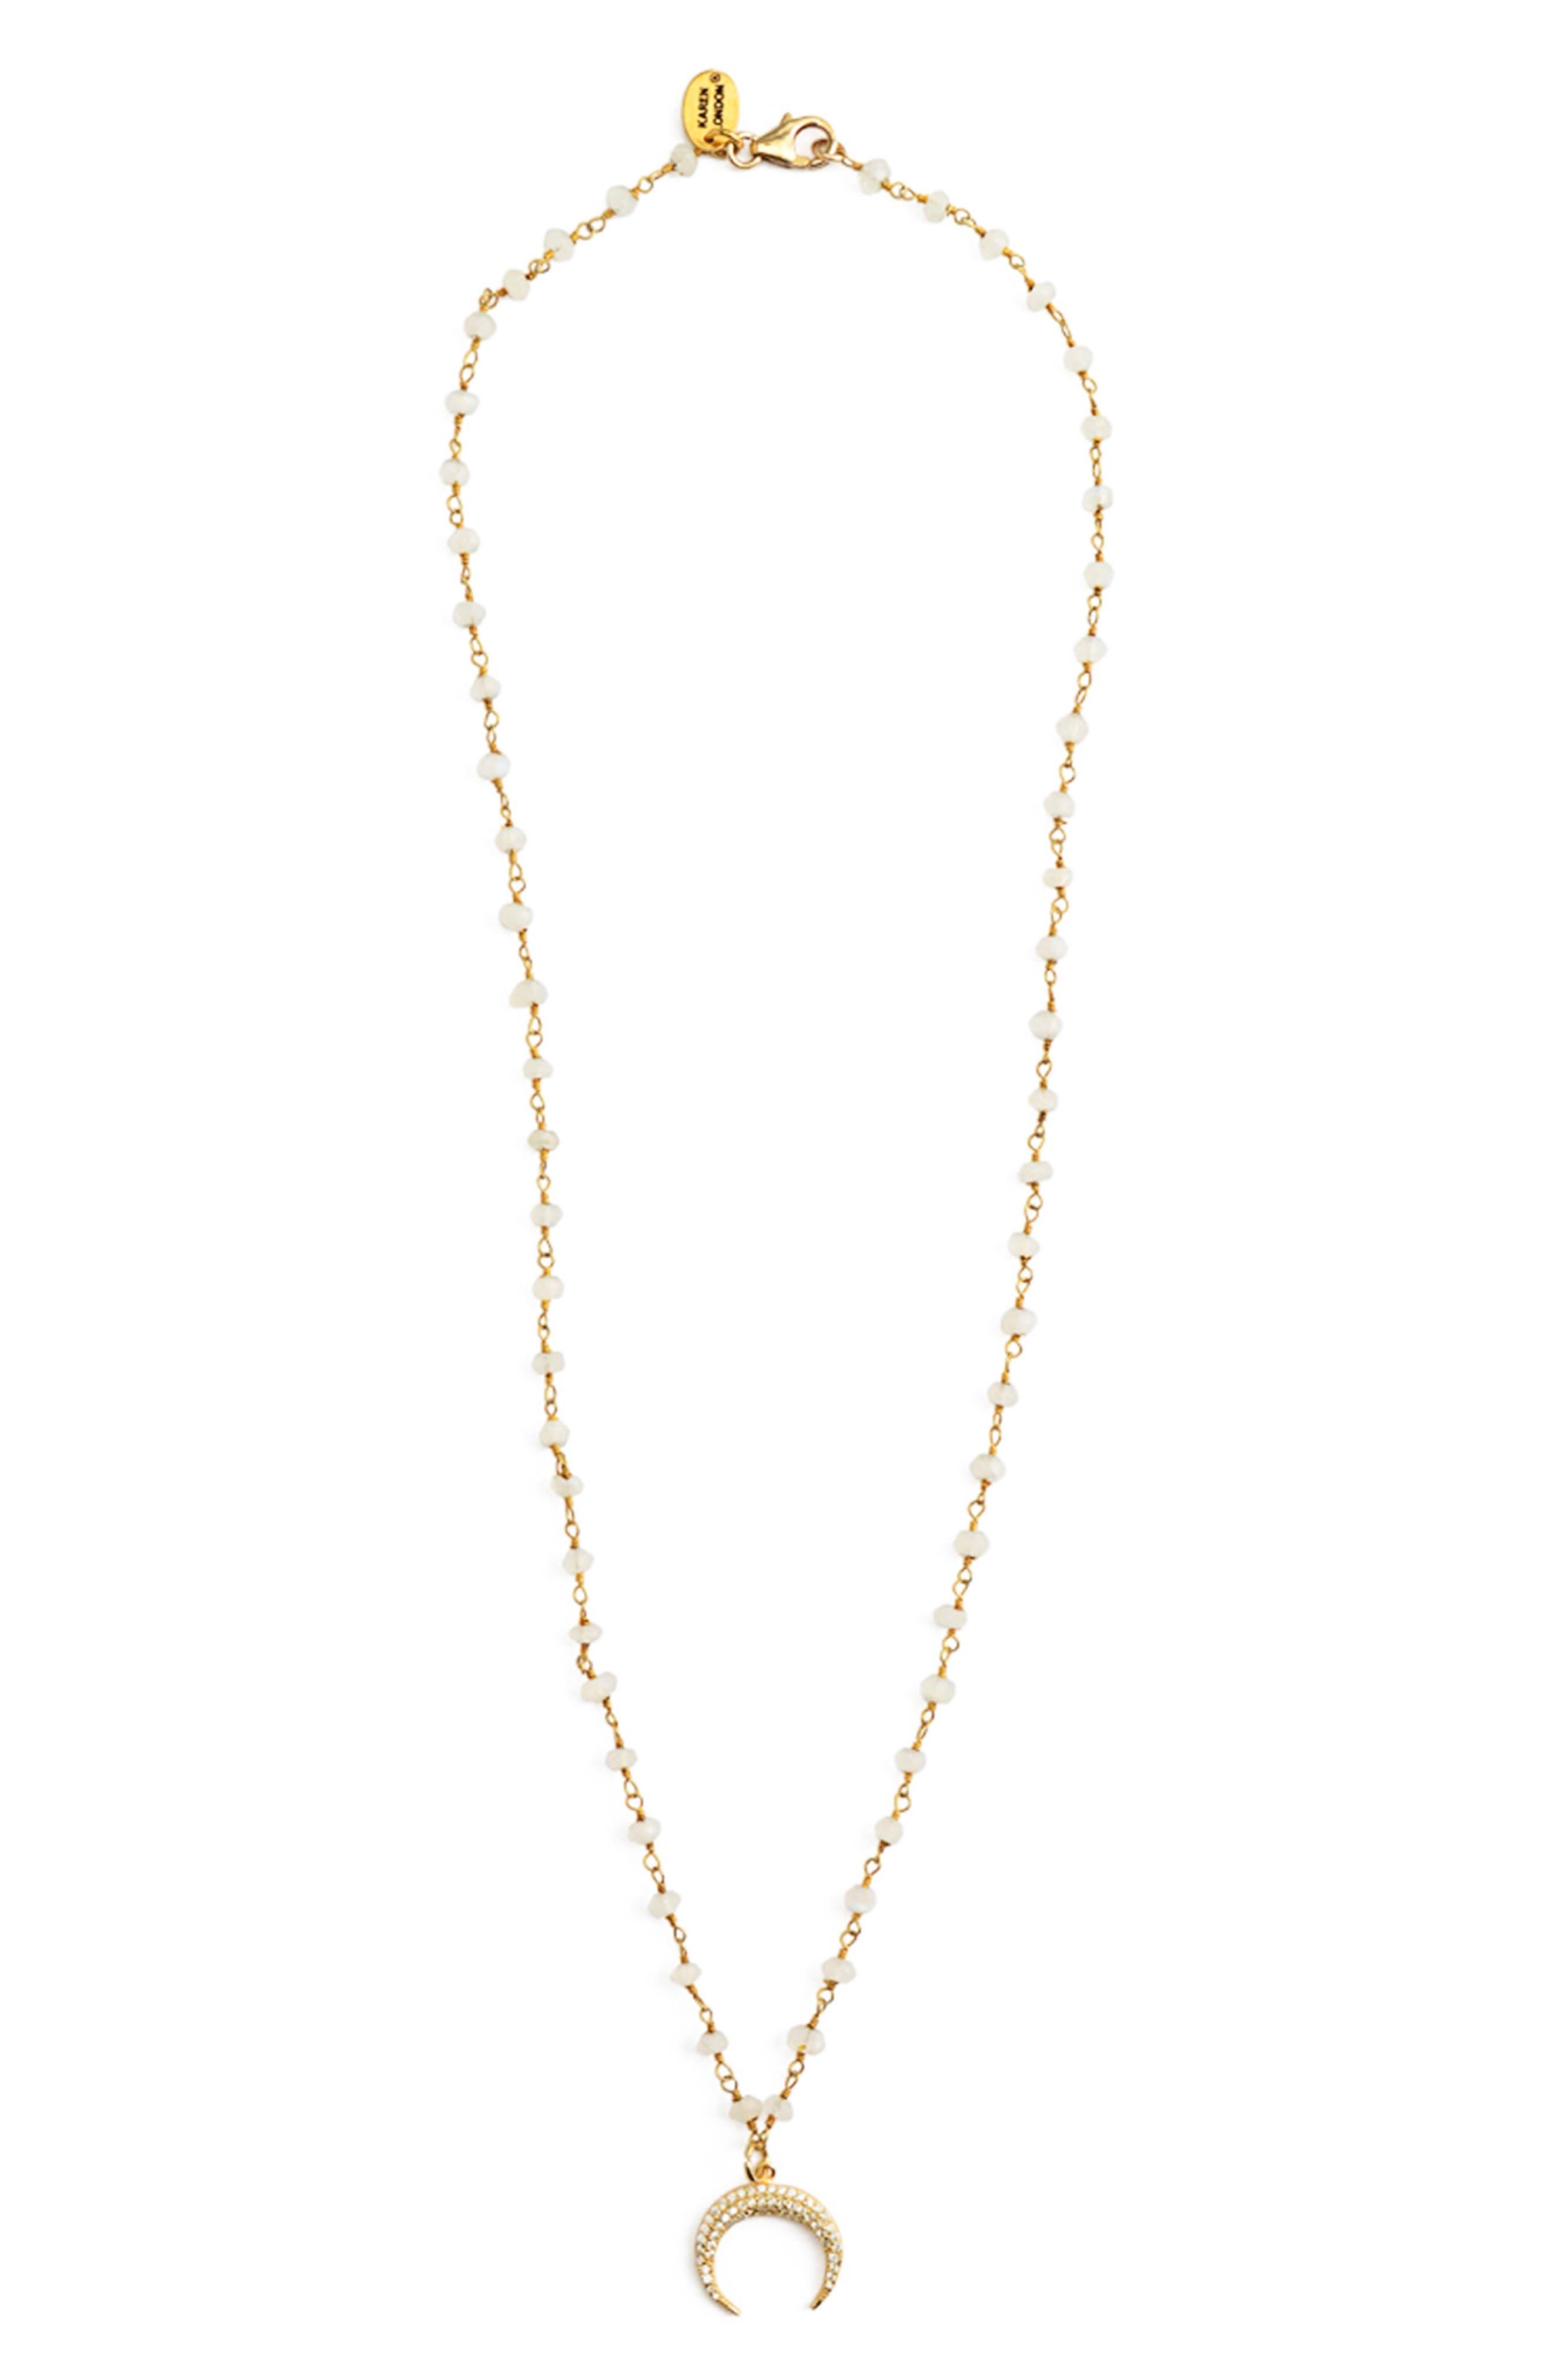 Alternate Image 1 Selected - Karen London Cellini Pendant Necklace